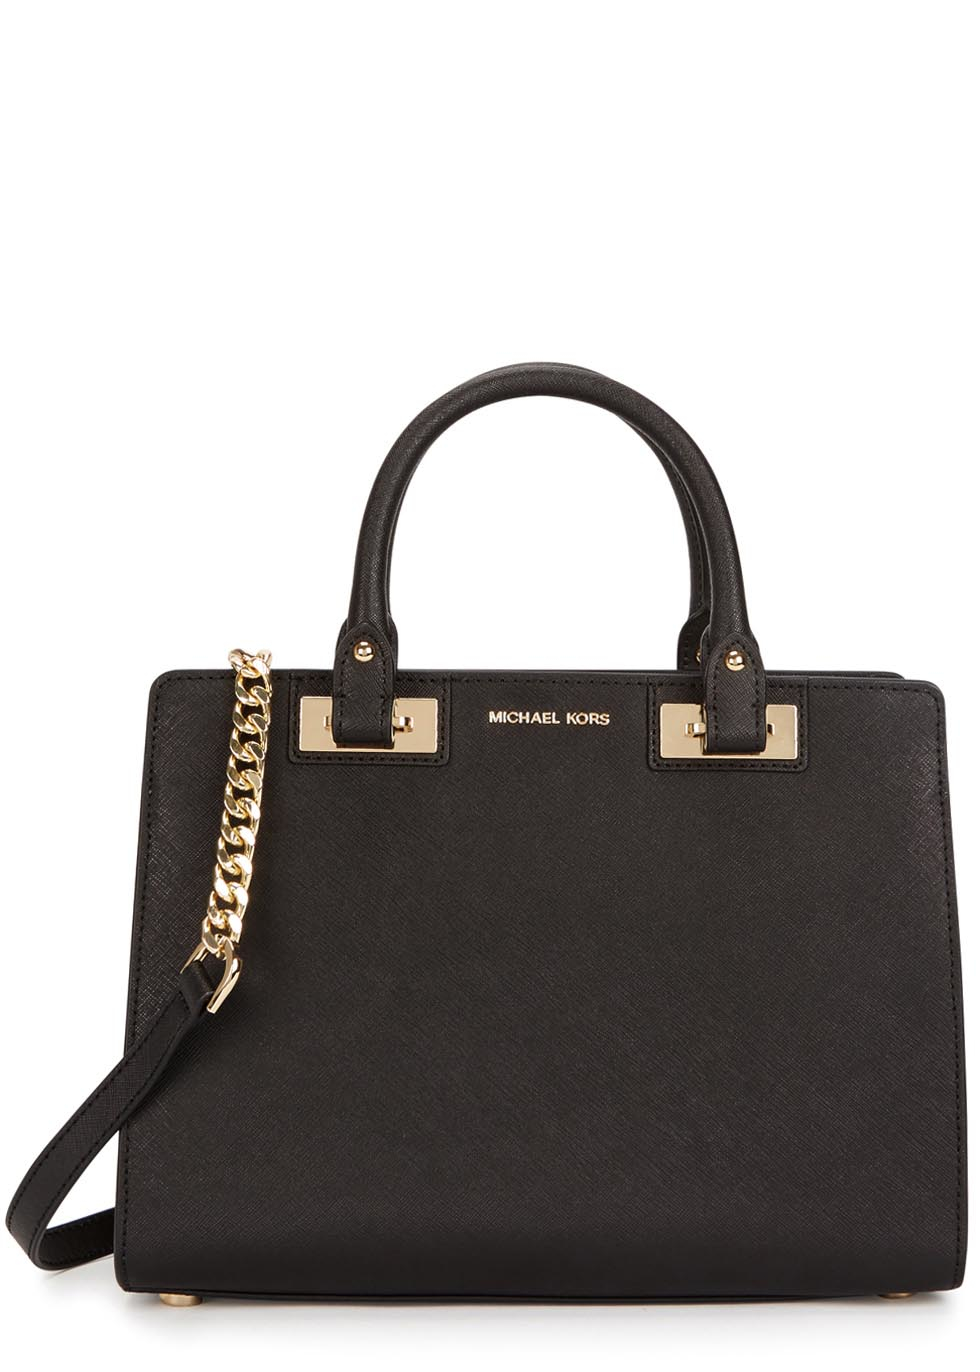 1811ed06b952 ... new style lyst michael kors quinn medium leather shoulder bag in met  08c18 1b892